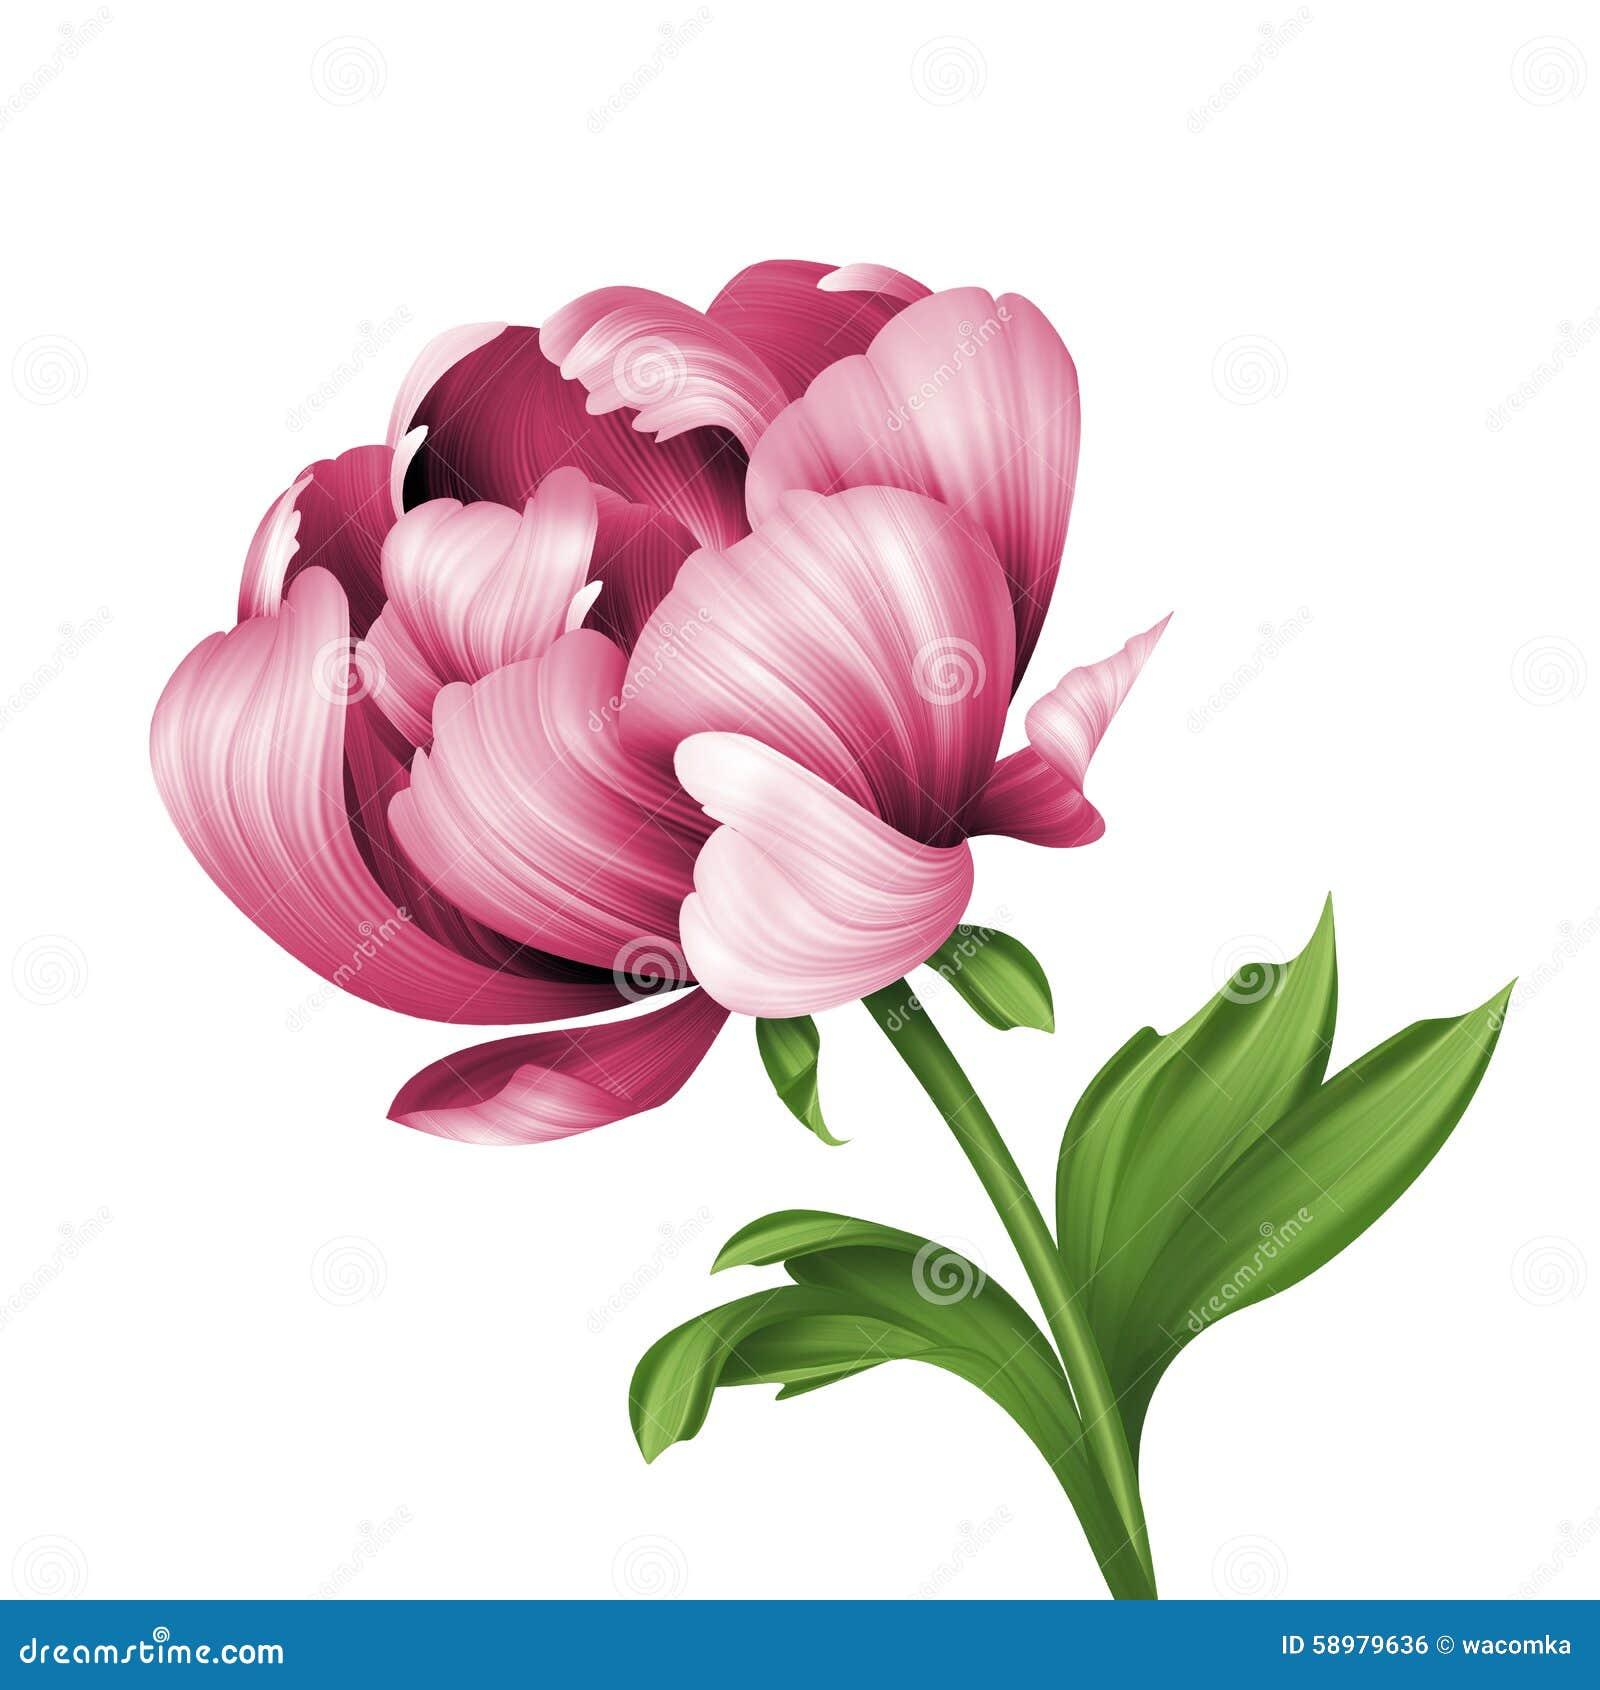 botanical illustration rose black and white